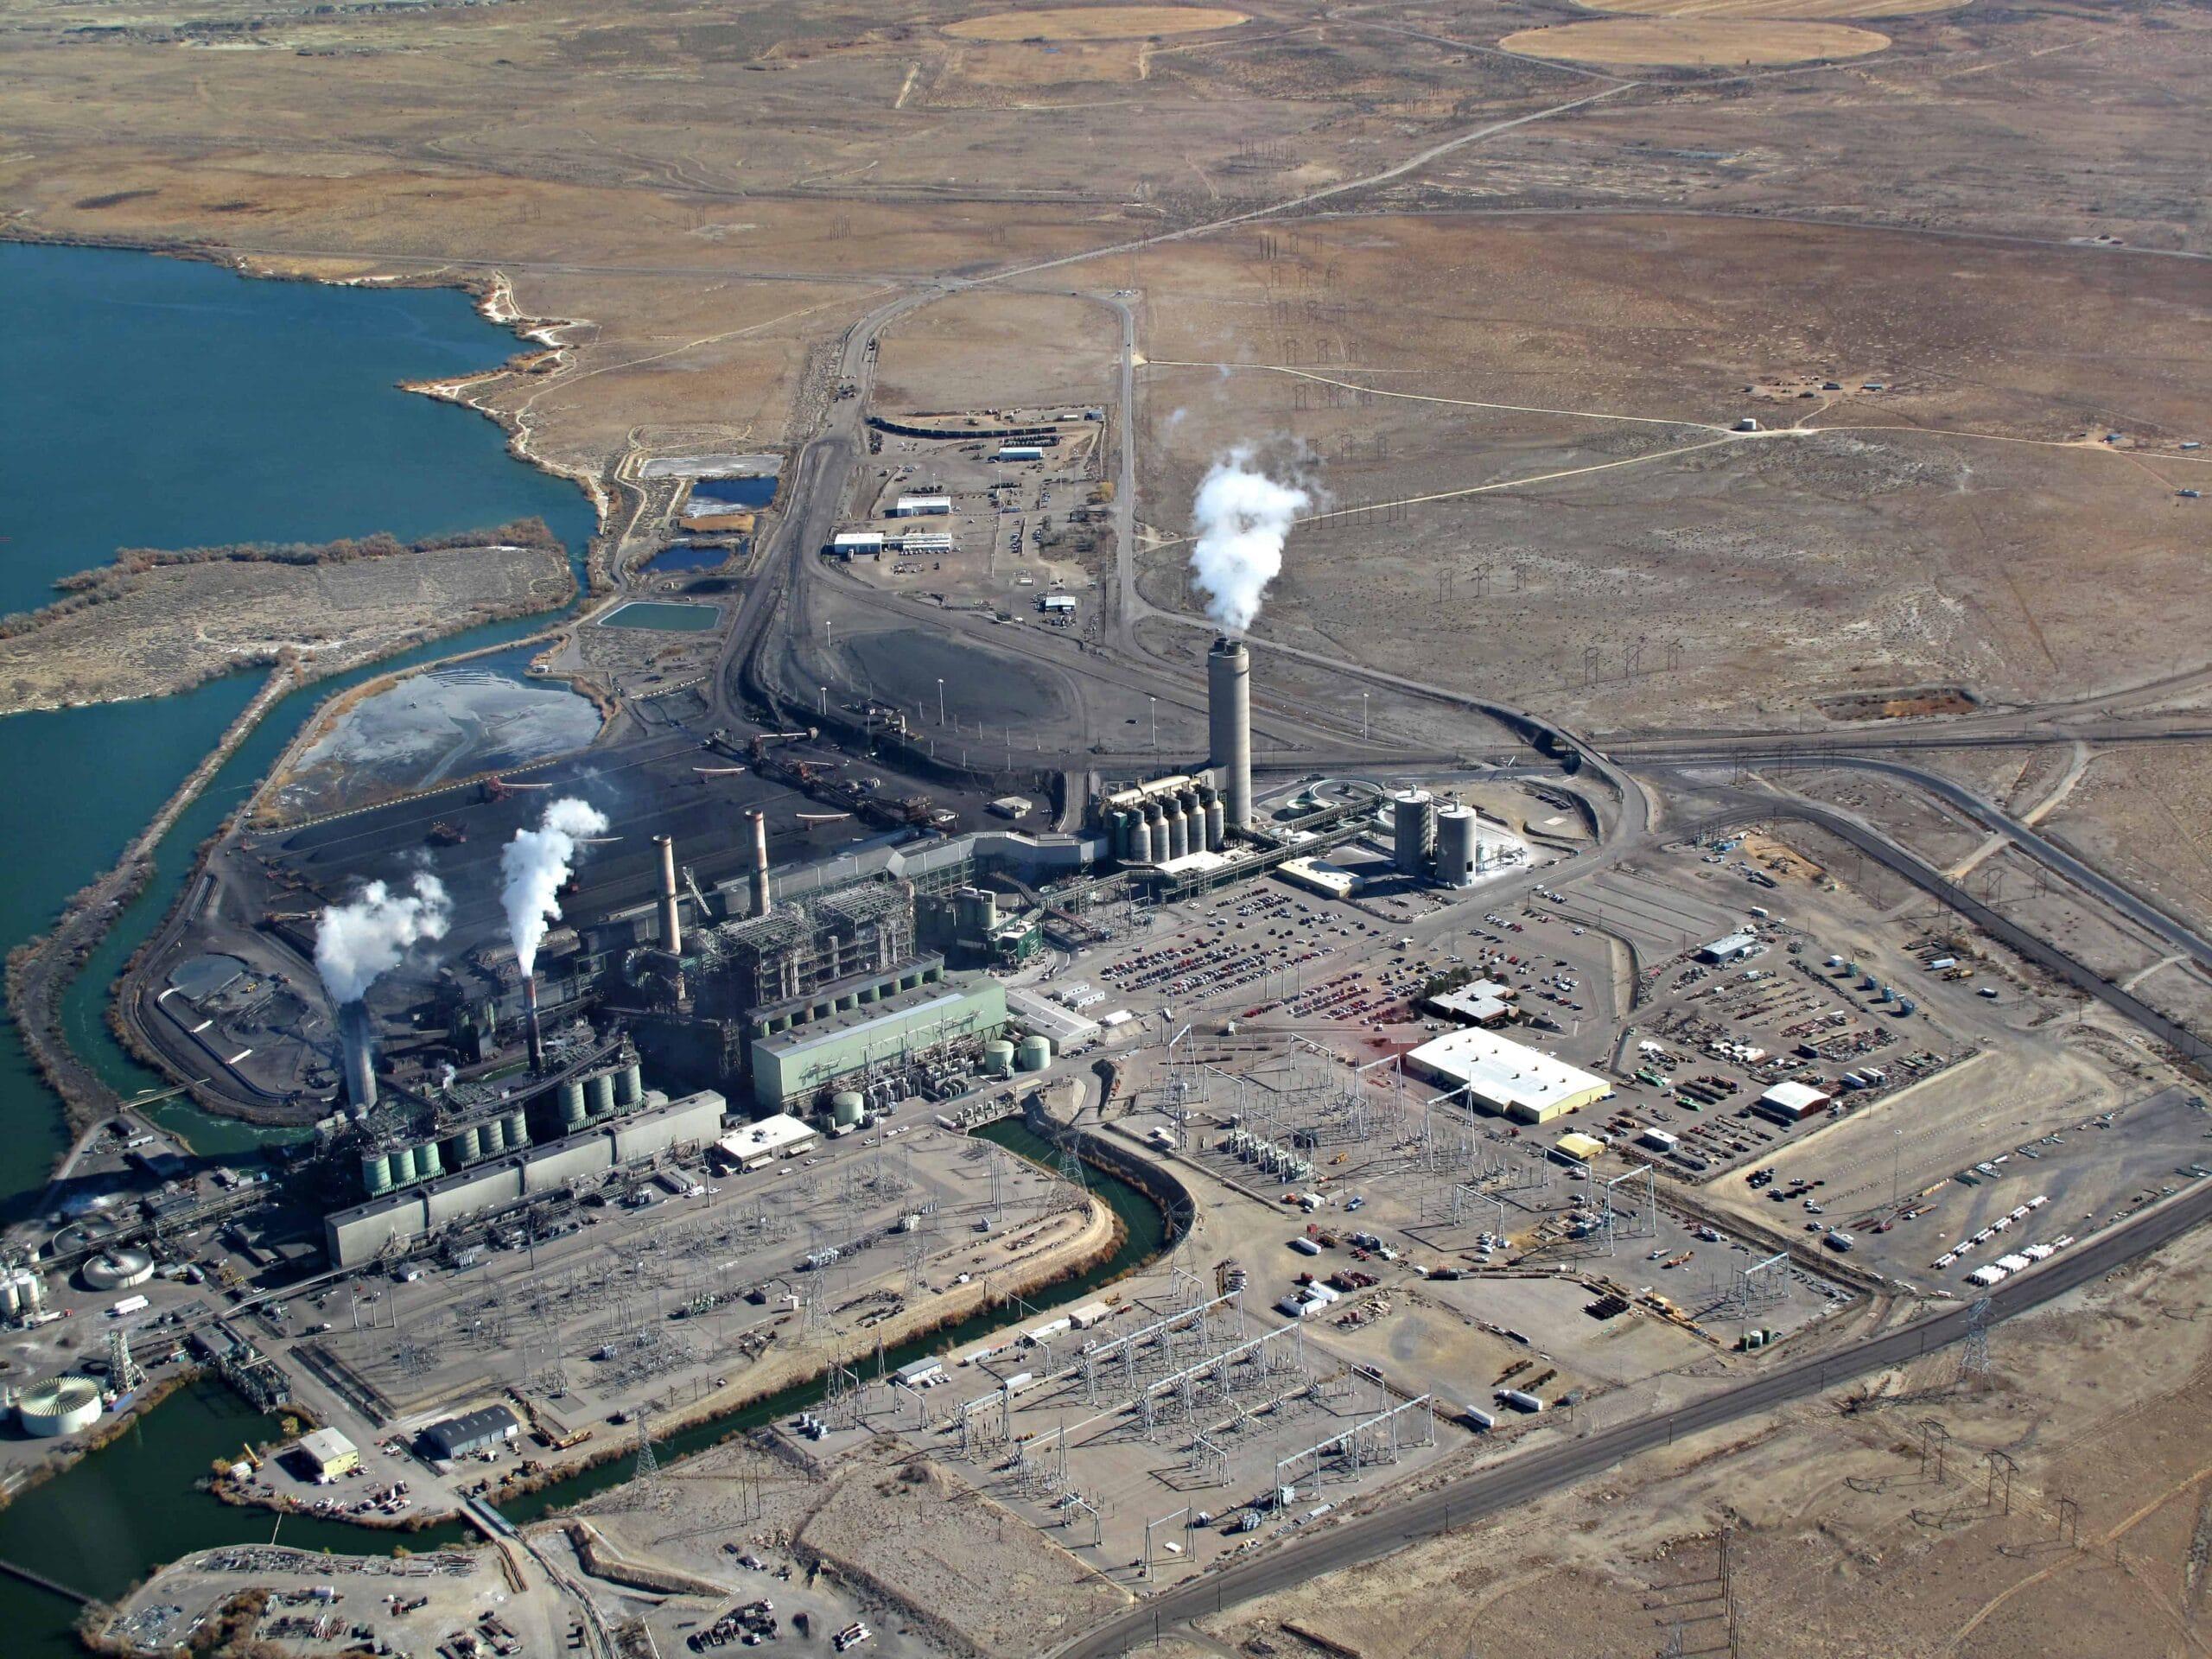 How Arizona Public Service's four corners plant has hurt customers